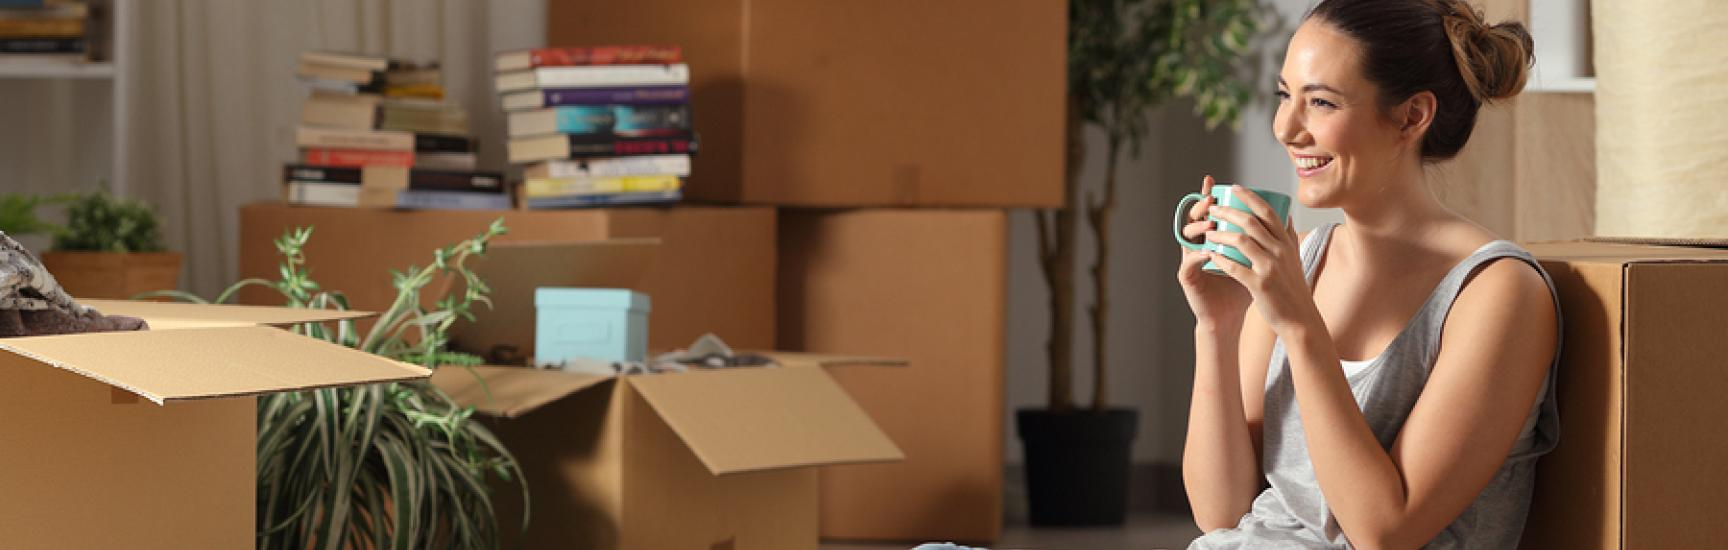 Why consider renter's insurance